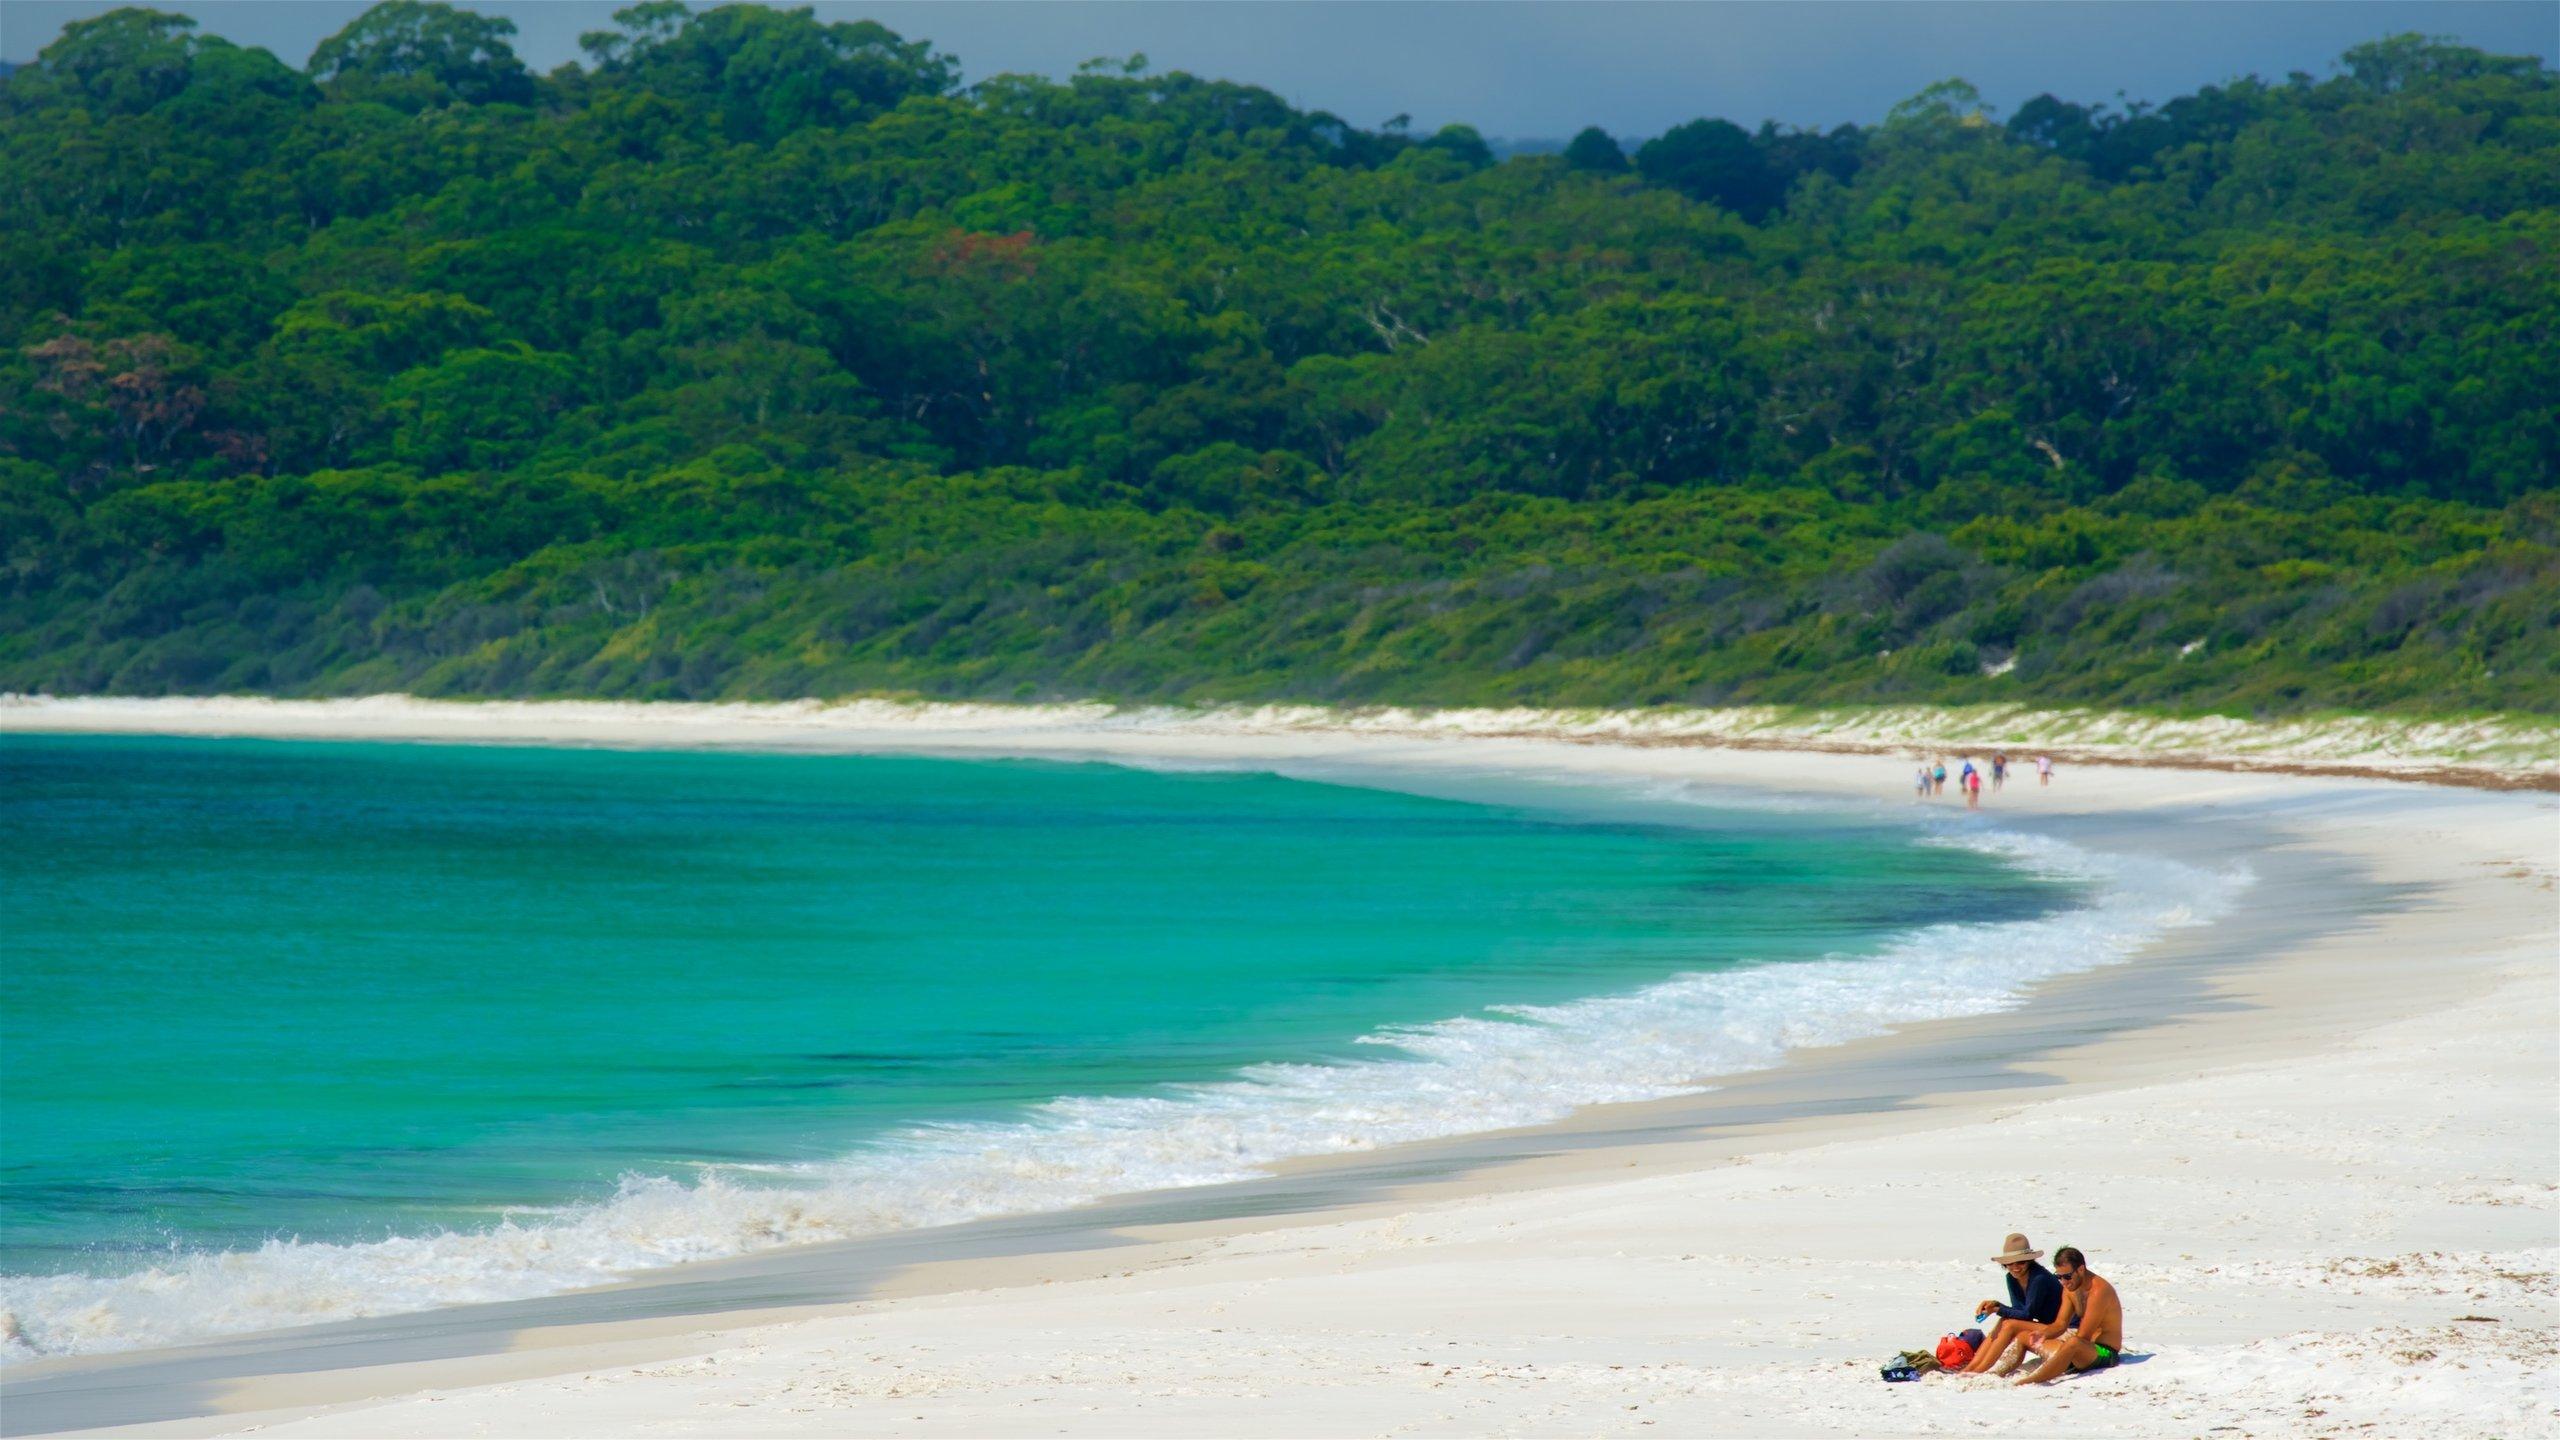 Hyams Beach, New South Wales, Australia